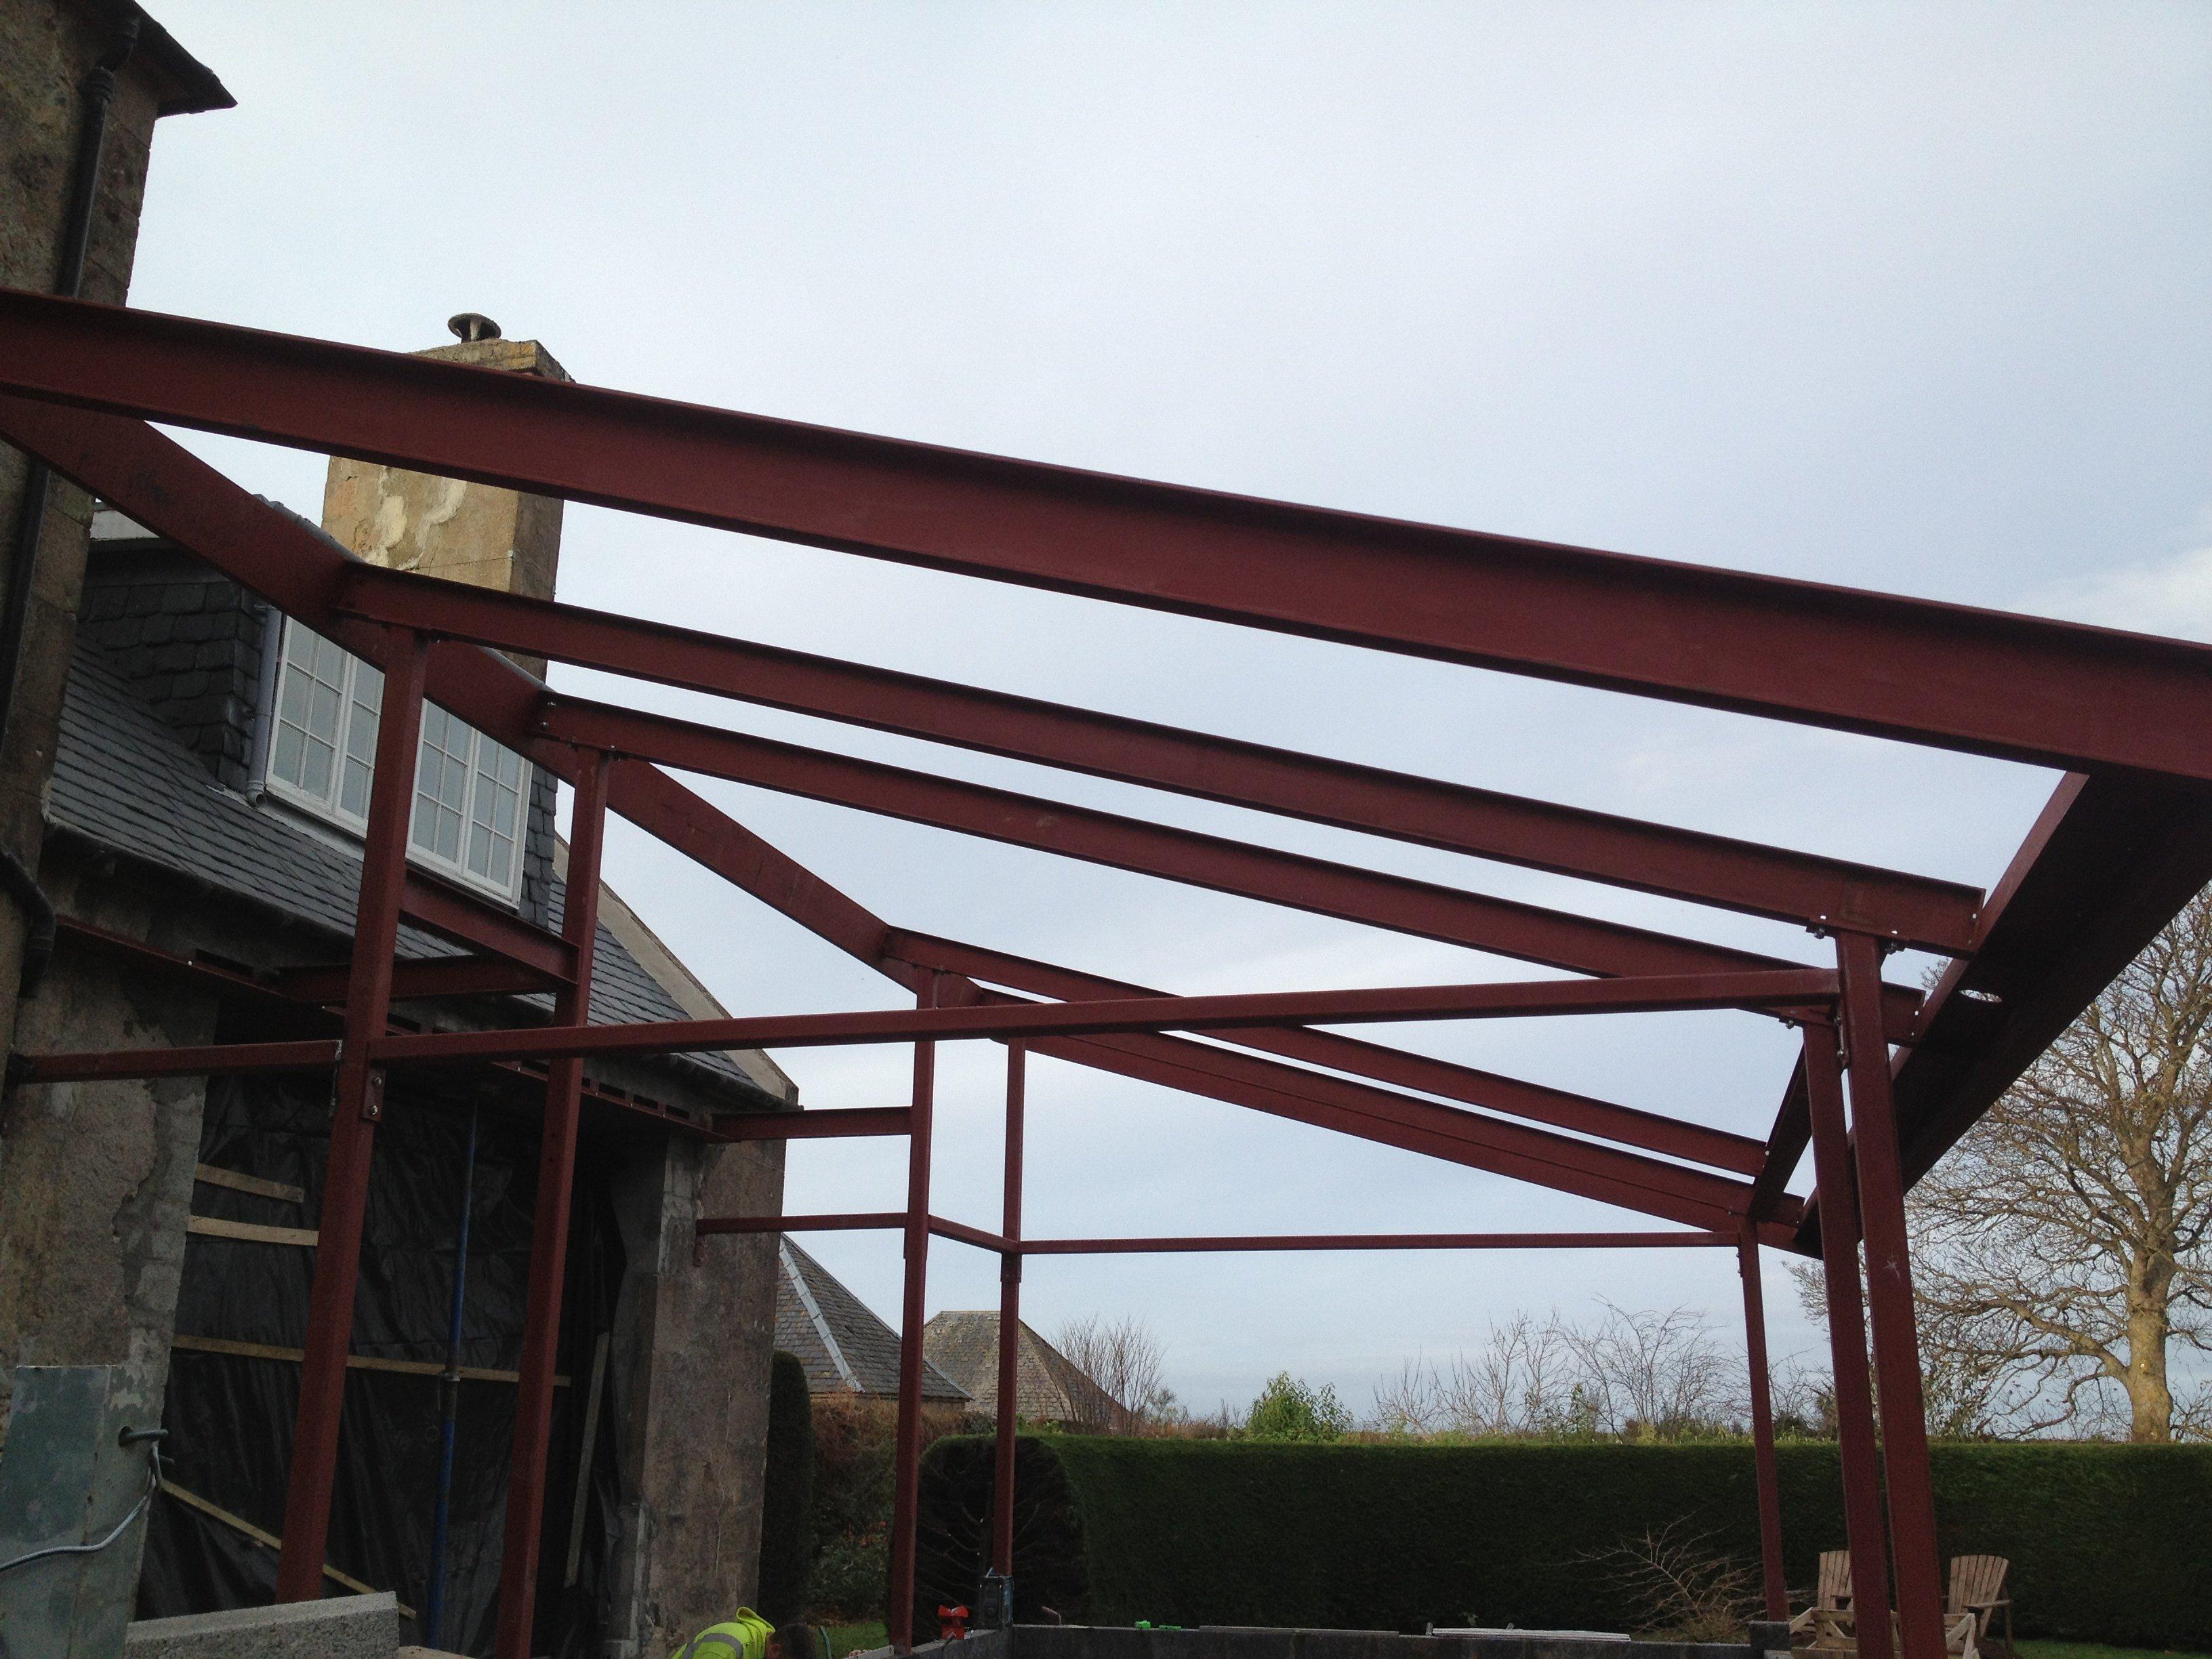 bespoke metal structures